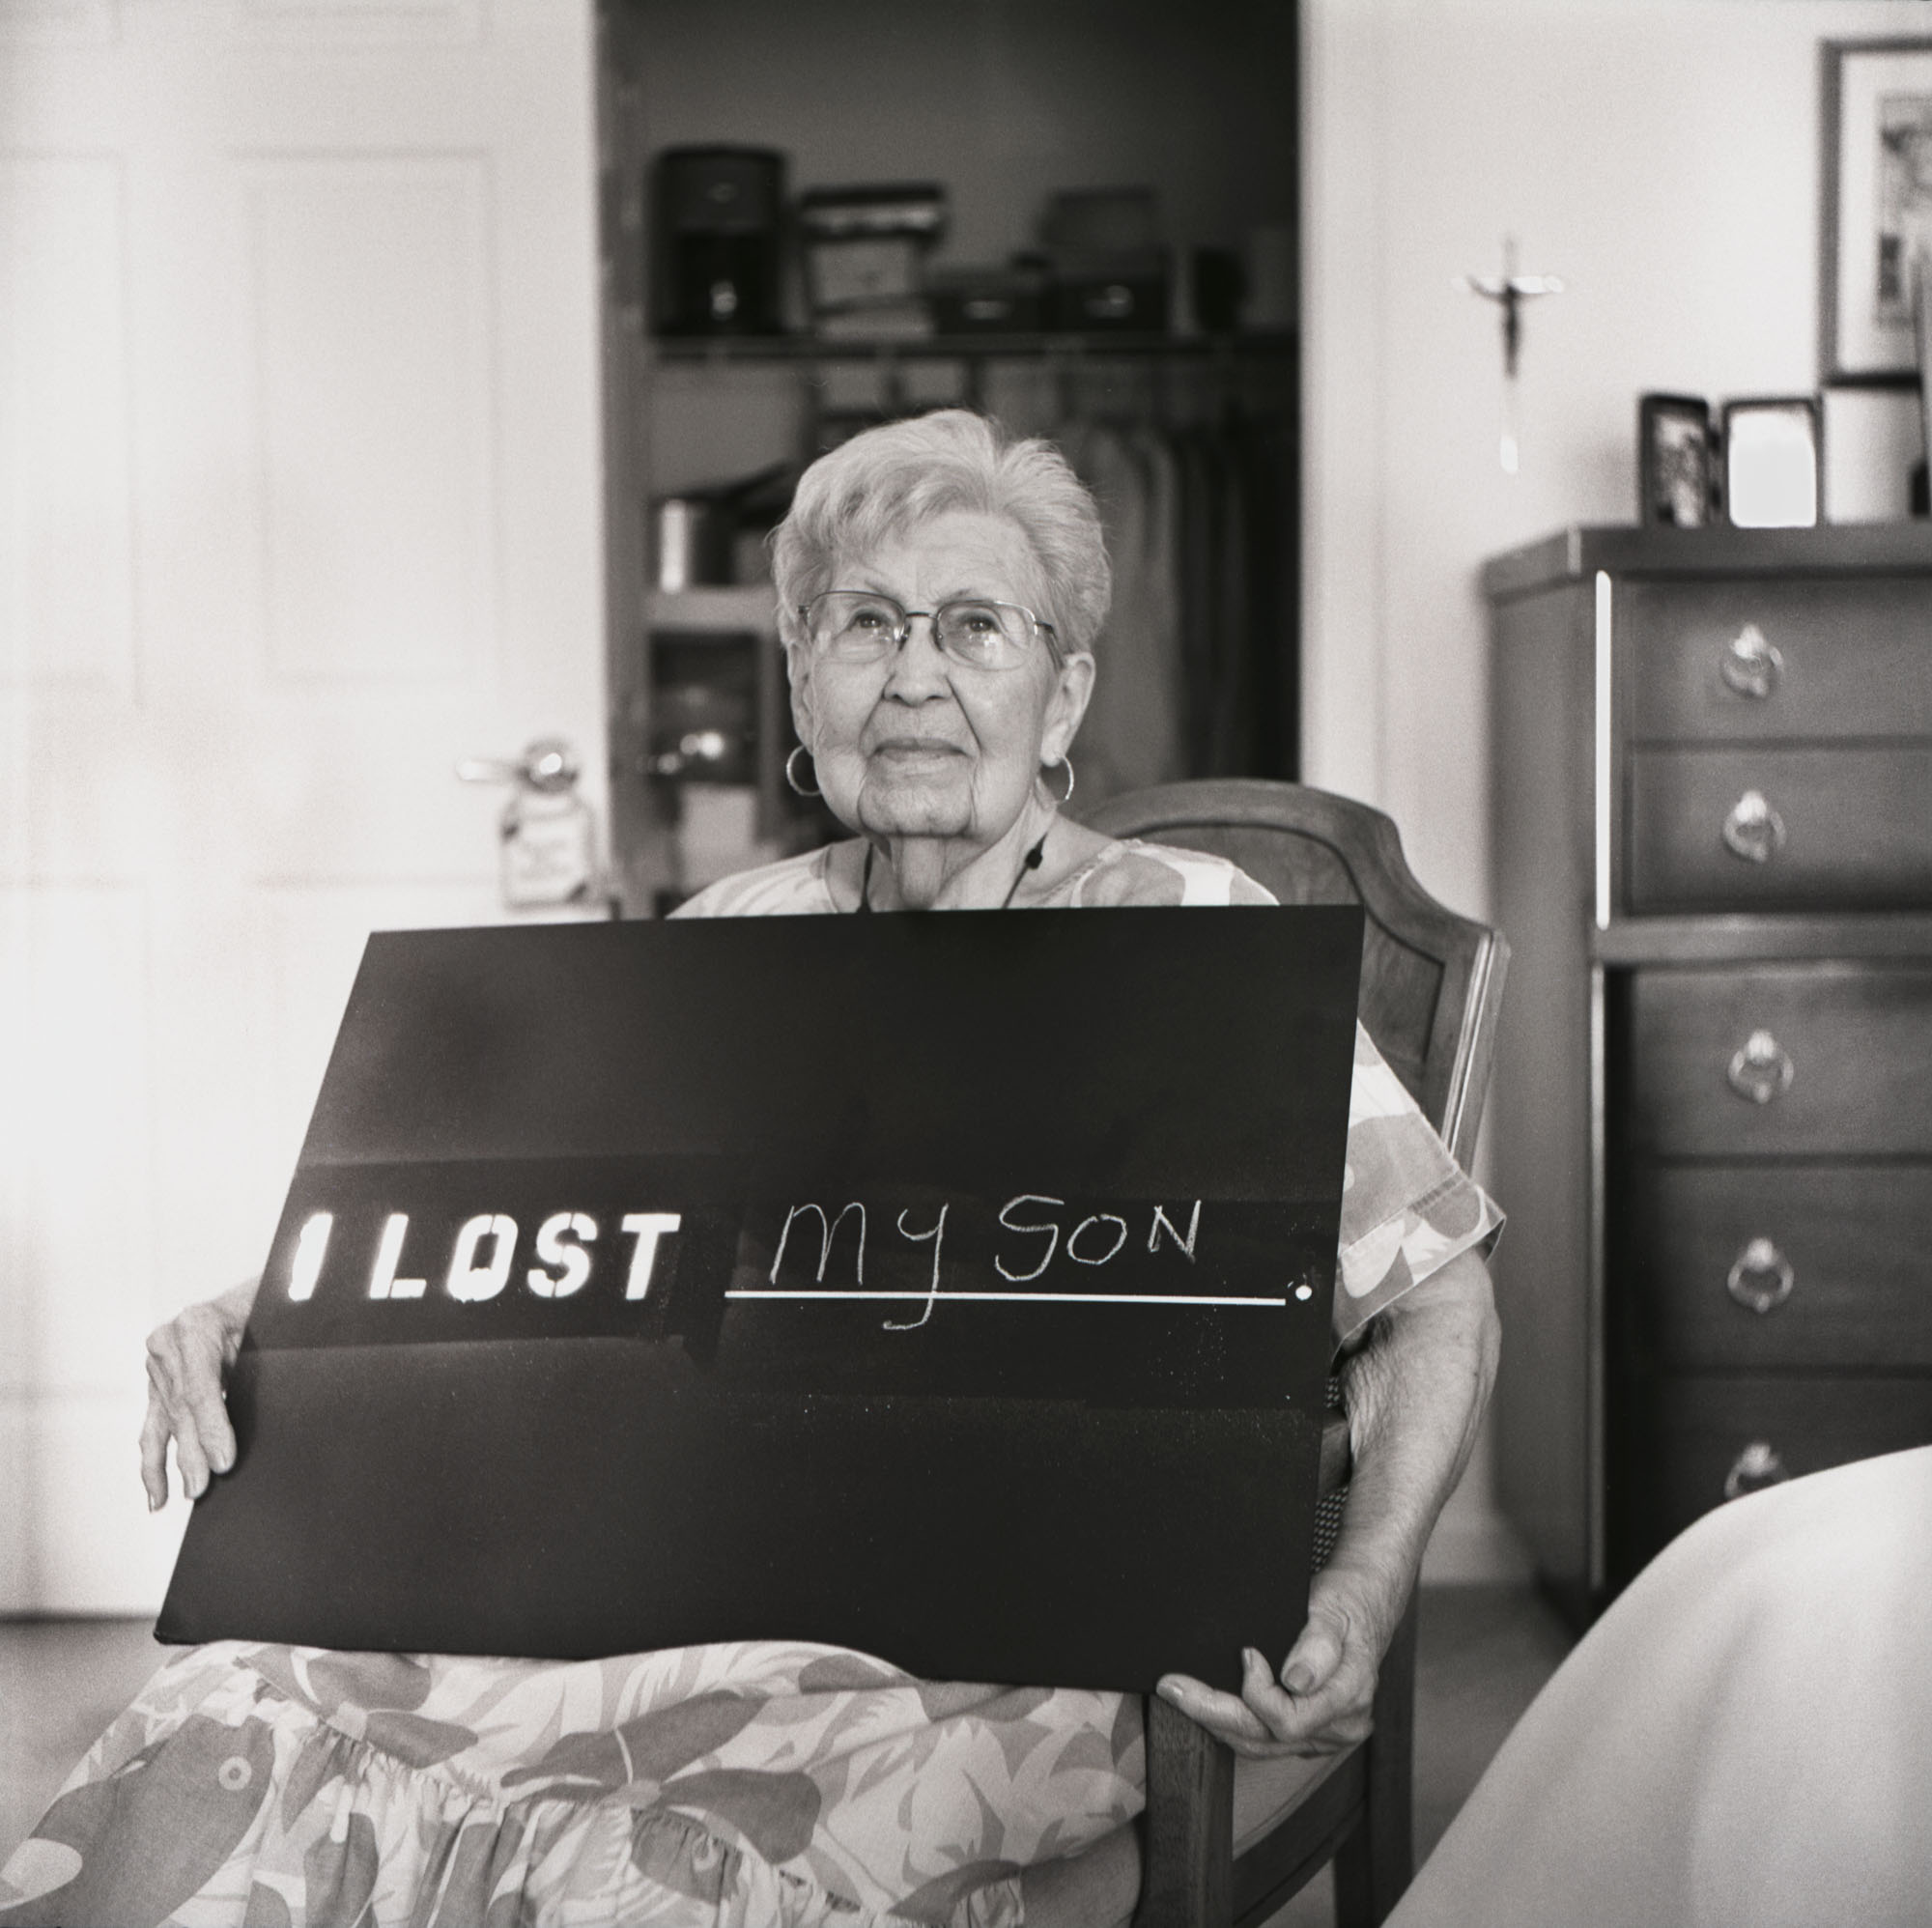 I Lost: Irene